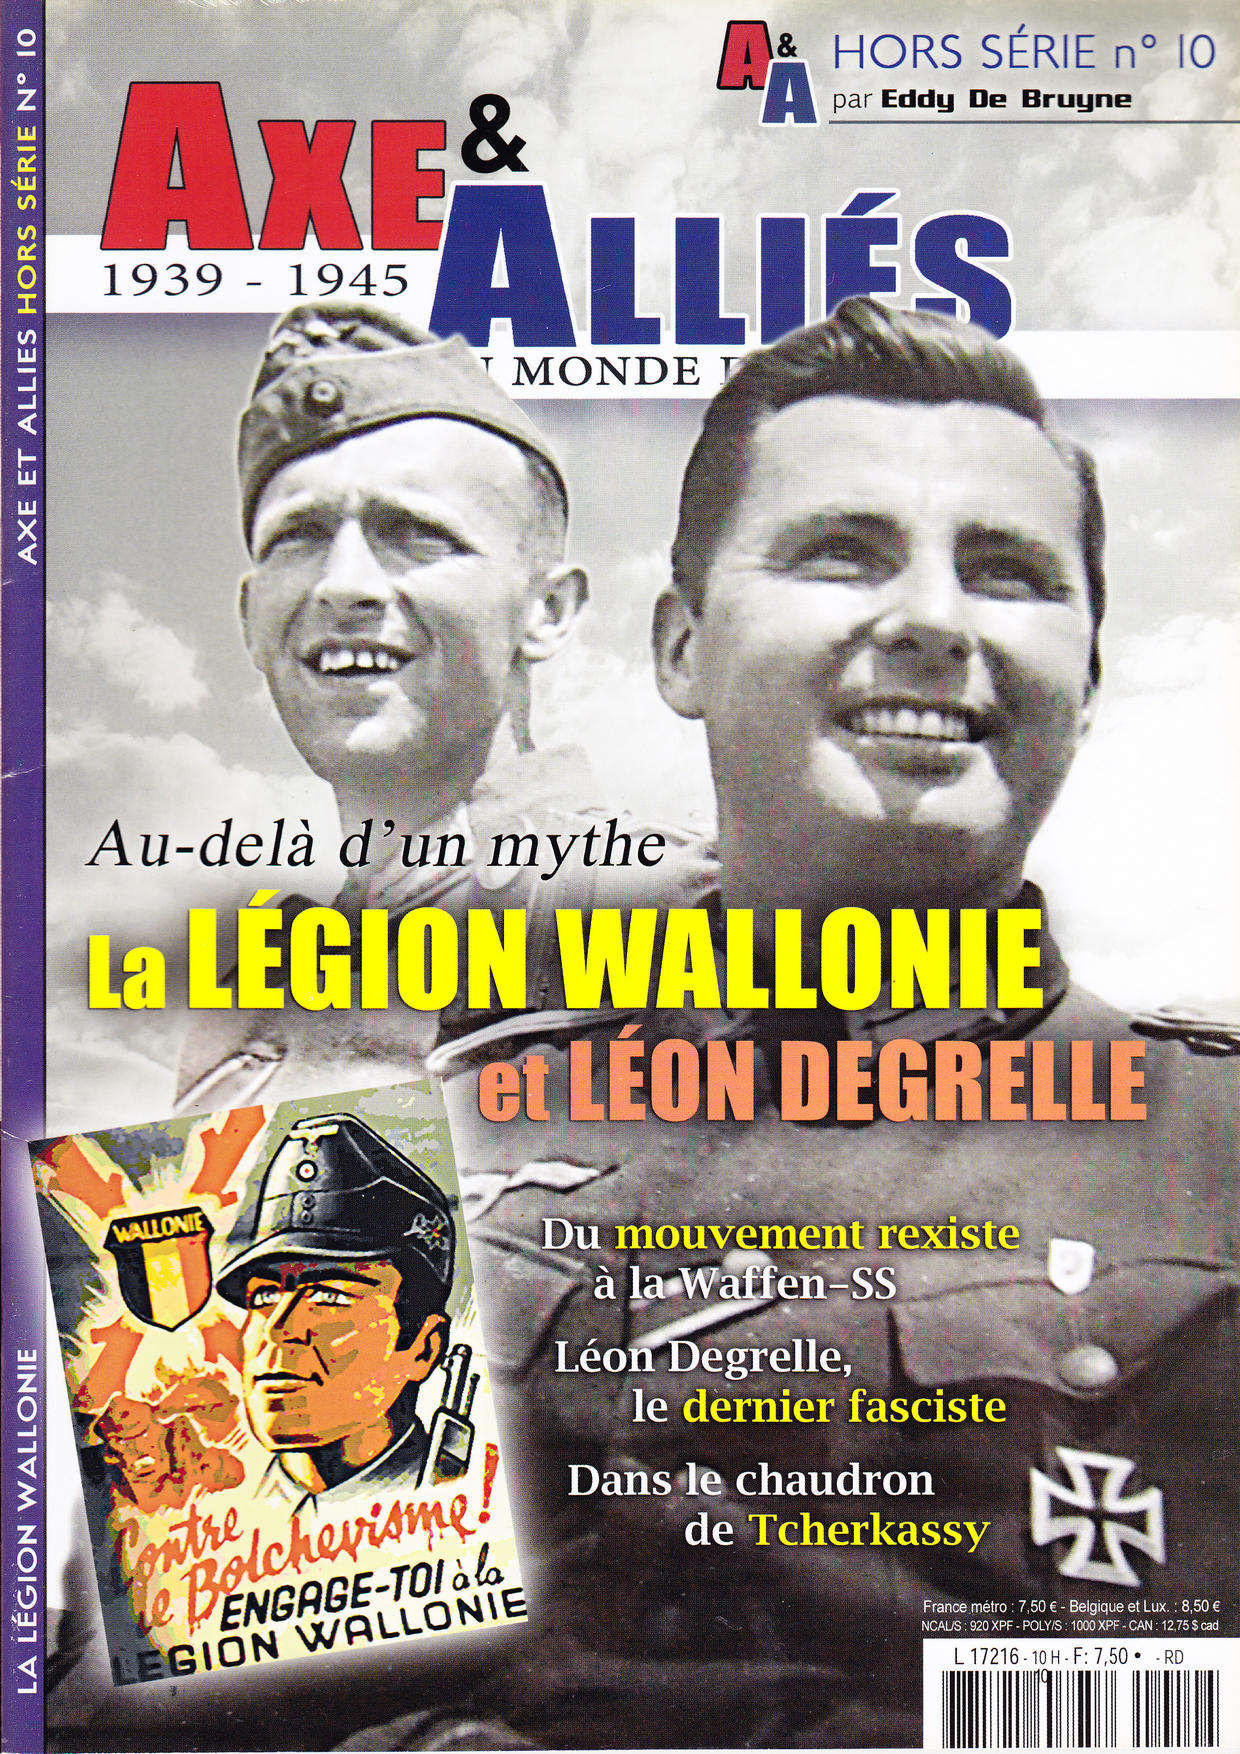 Axe & Alliés - 1939 - 1945 - Hors série 10